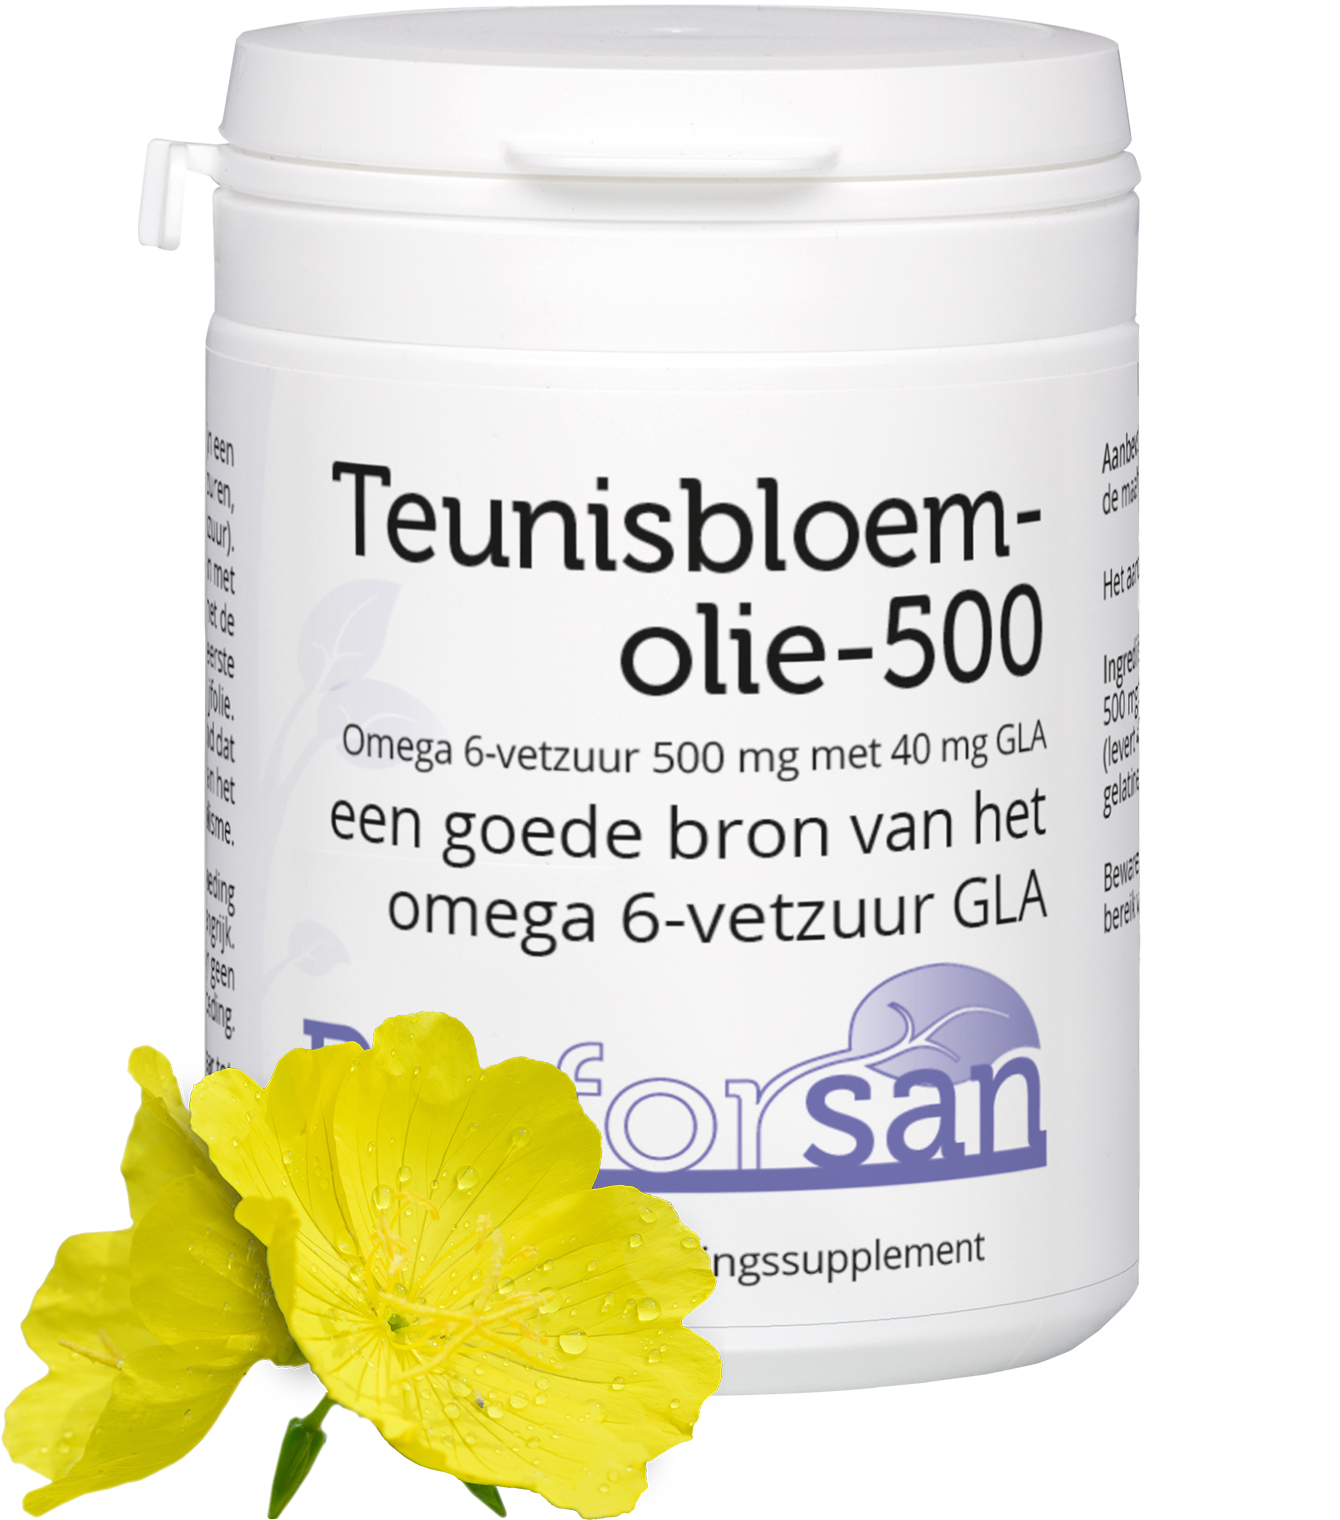 Proforsan - Teunisbloemolie-500 - 60 softgels